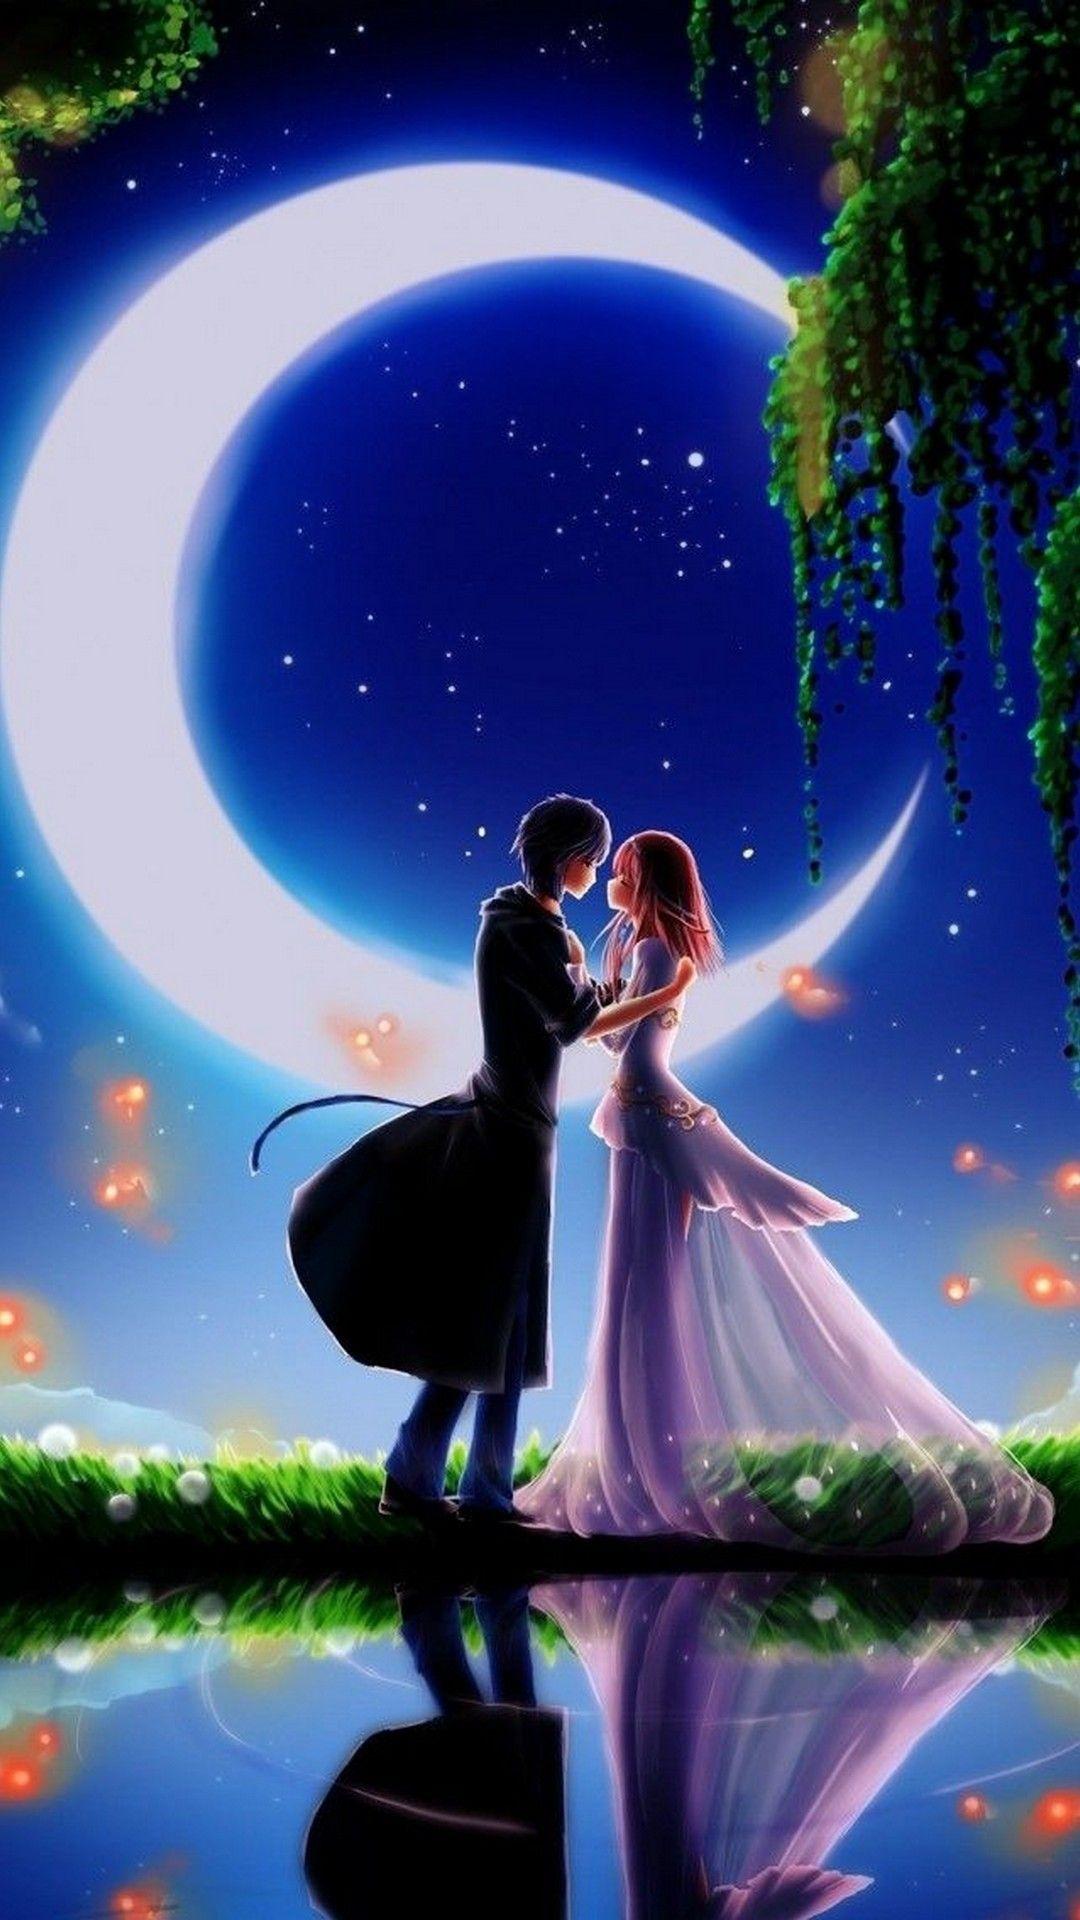 Love Iphone 6 Wallpaper Fondos De Pantalla De Parejas Enamoradas Anime Romanticos Fondo De Pantalla De Android